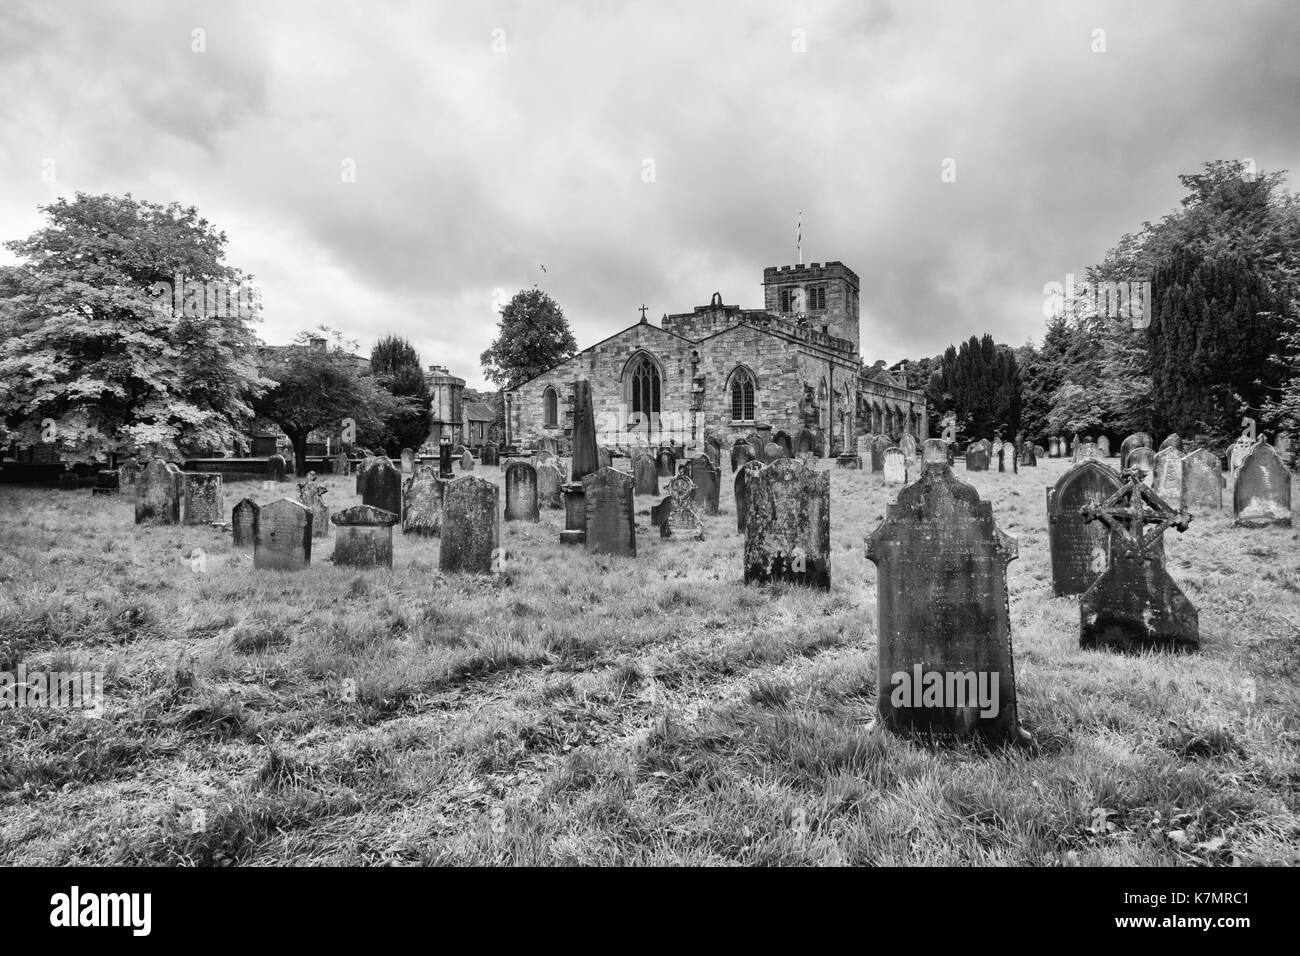 St Lawrence's Church, Boroughgate, Appleby, Cumbria, North West England - Stock Image